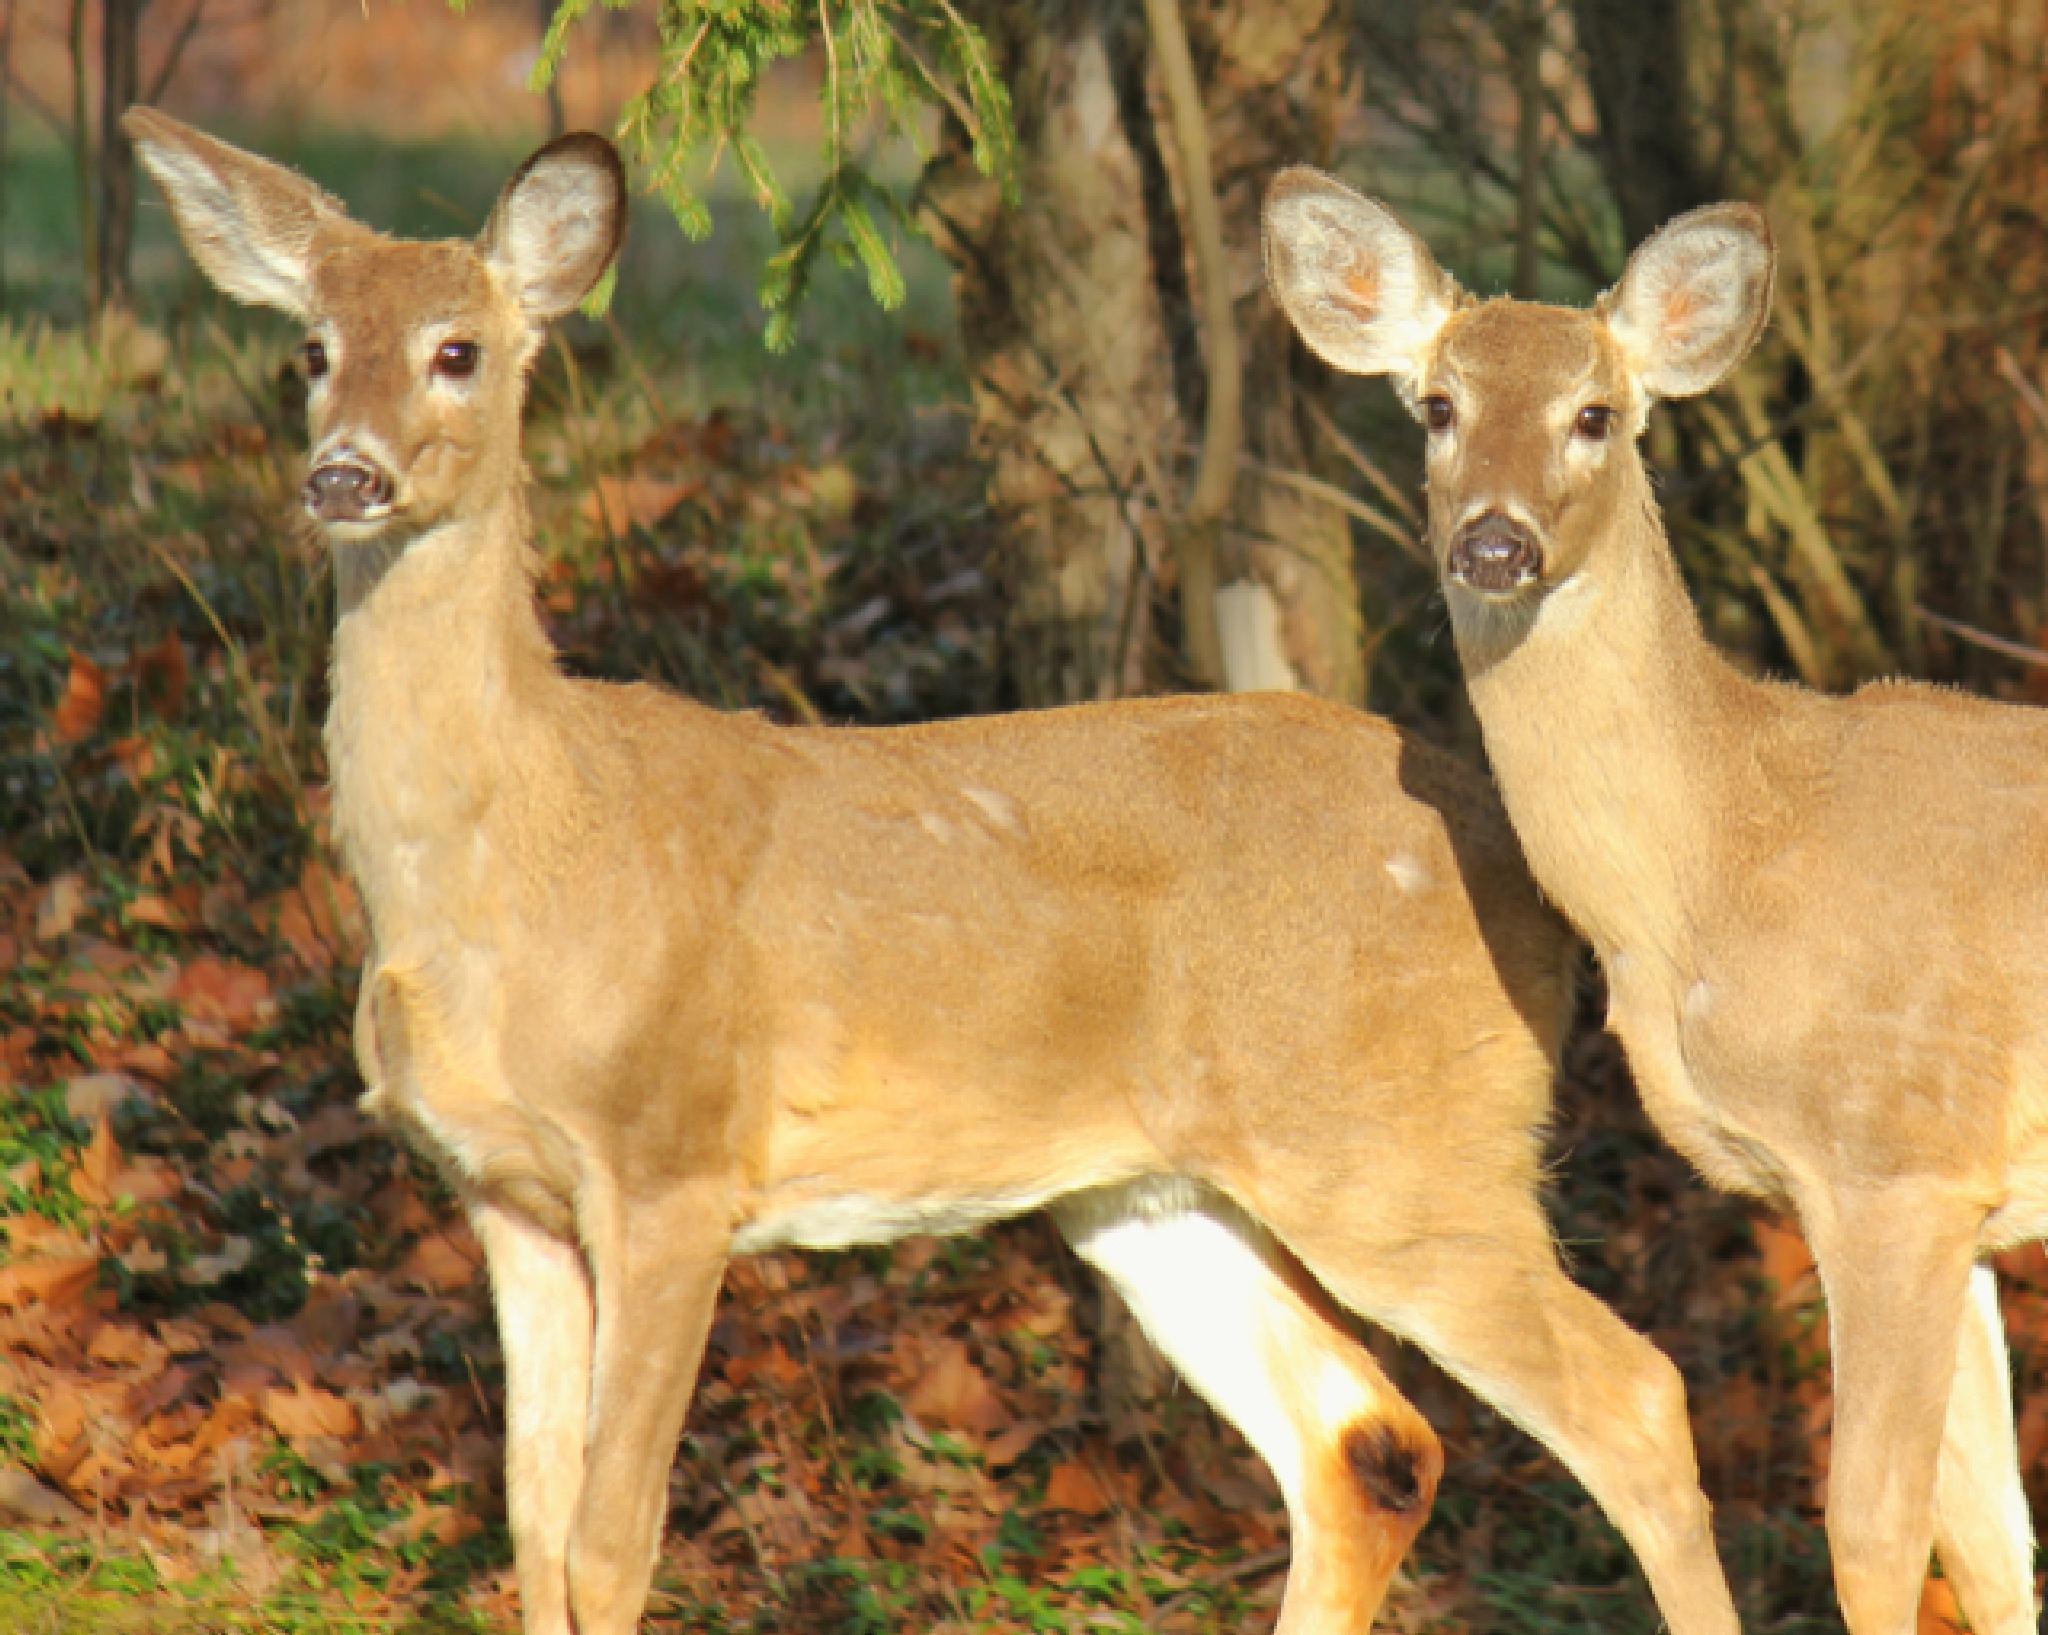 Two Deer by mattdevore